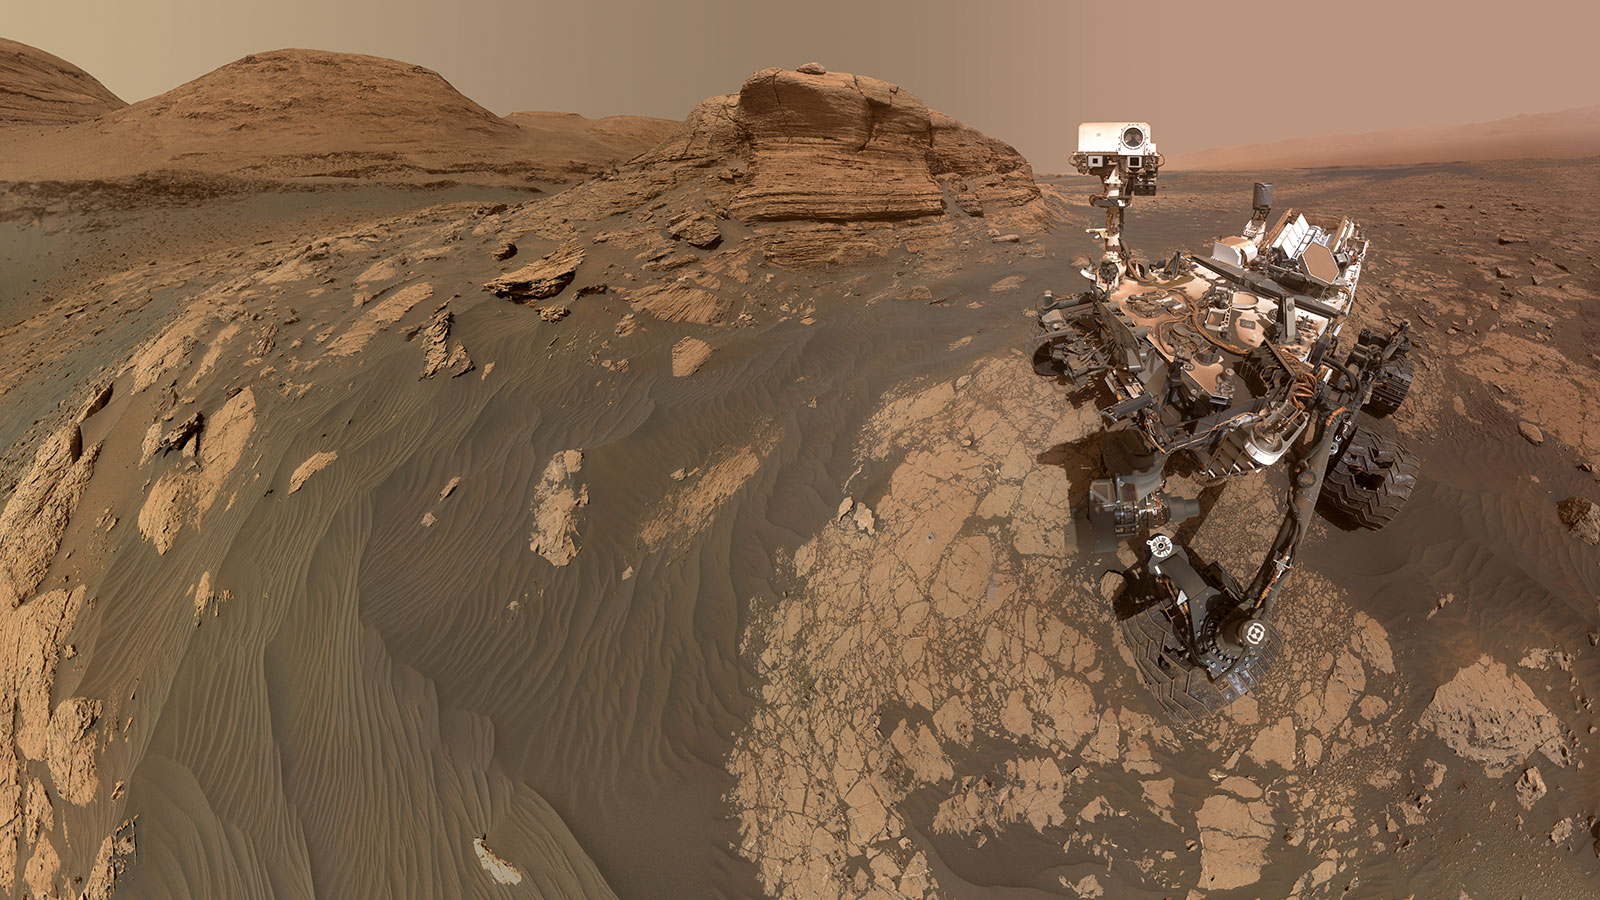 Forrás: NASA/JPL-CALTECH/MSS